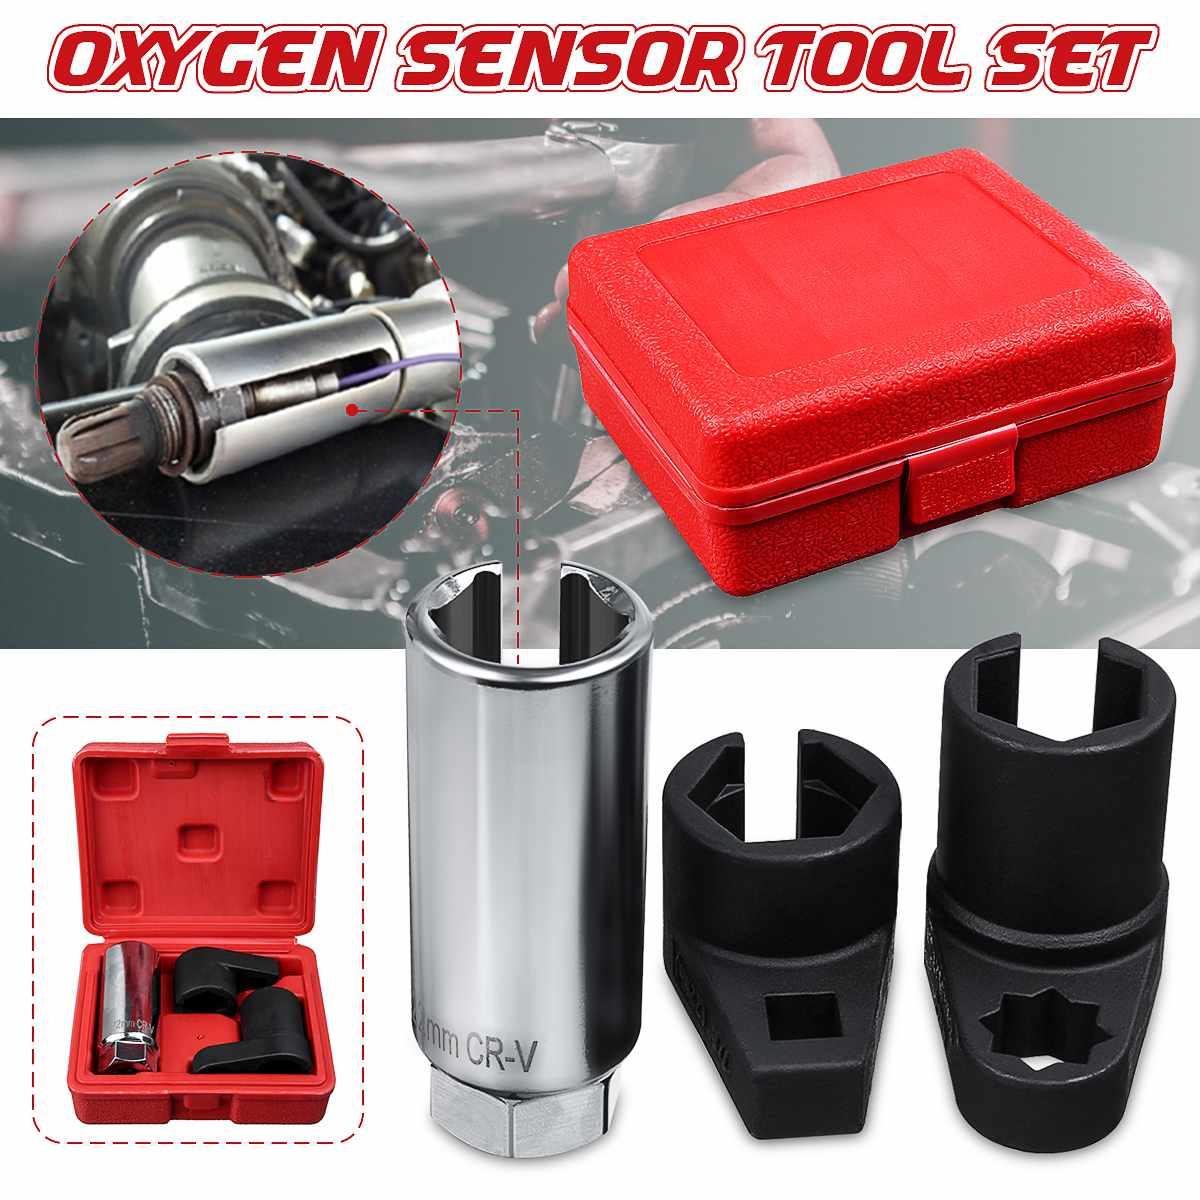 3pcs Oxygen Sensor Socket Wrench Tool Kit Oxygen Sensor Socket Install Removal Tools